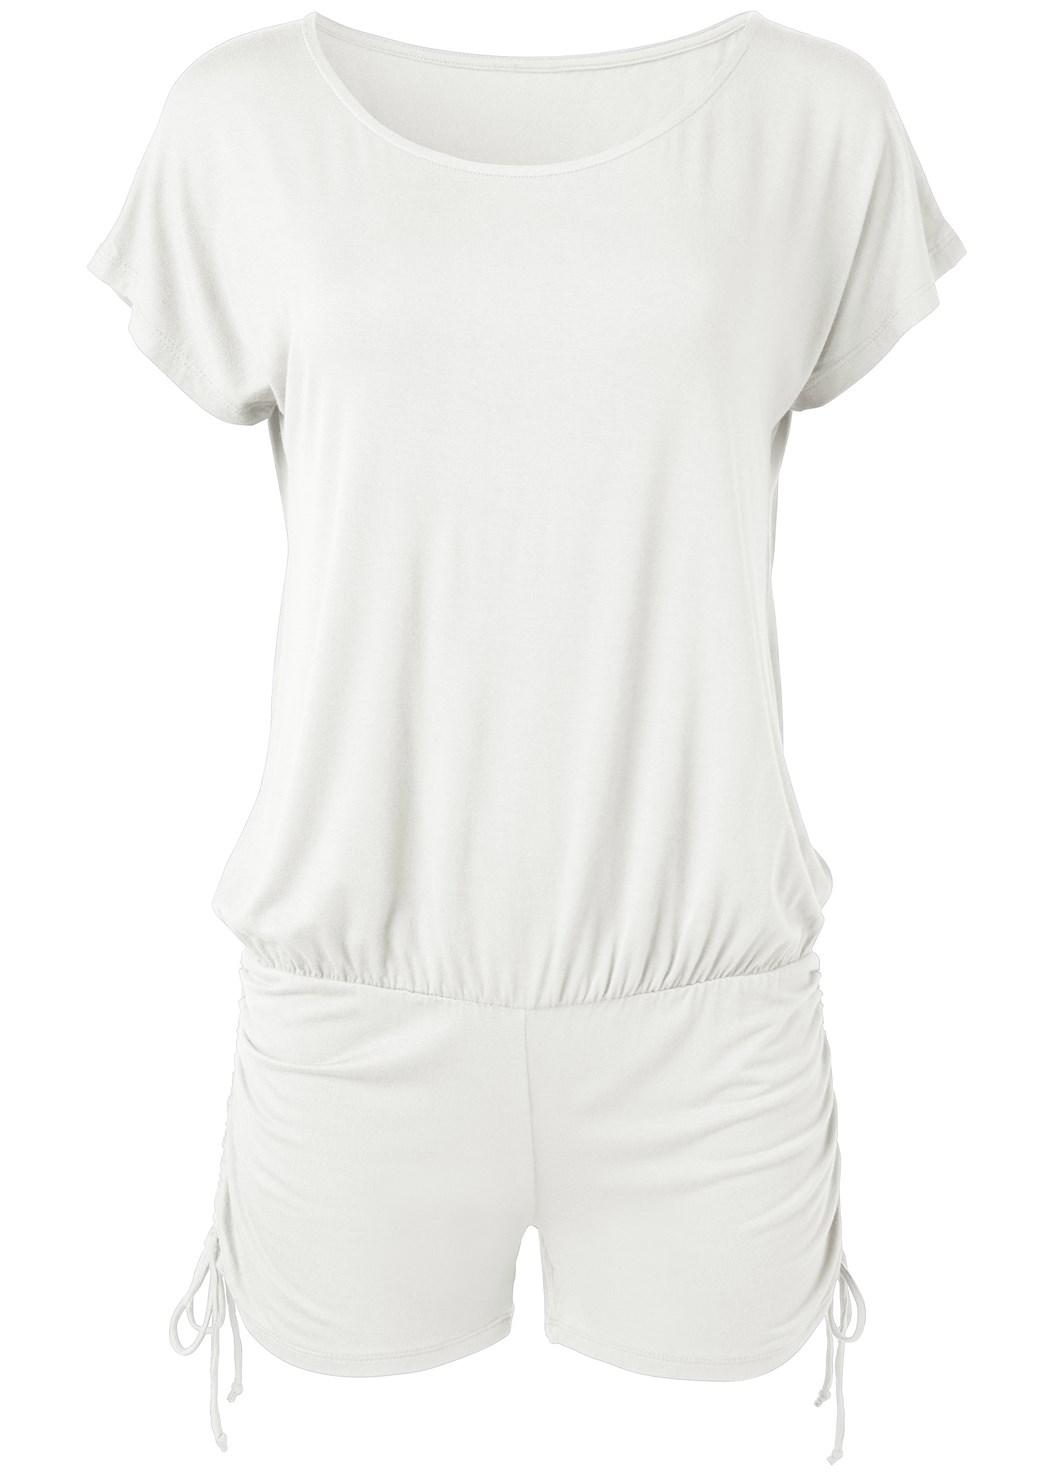 Adjustable Romper Cover-Up,Slimming One-Piece,Elastic Back Visor,Circular Straw Bag